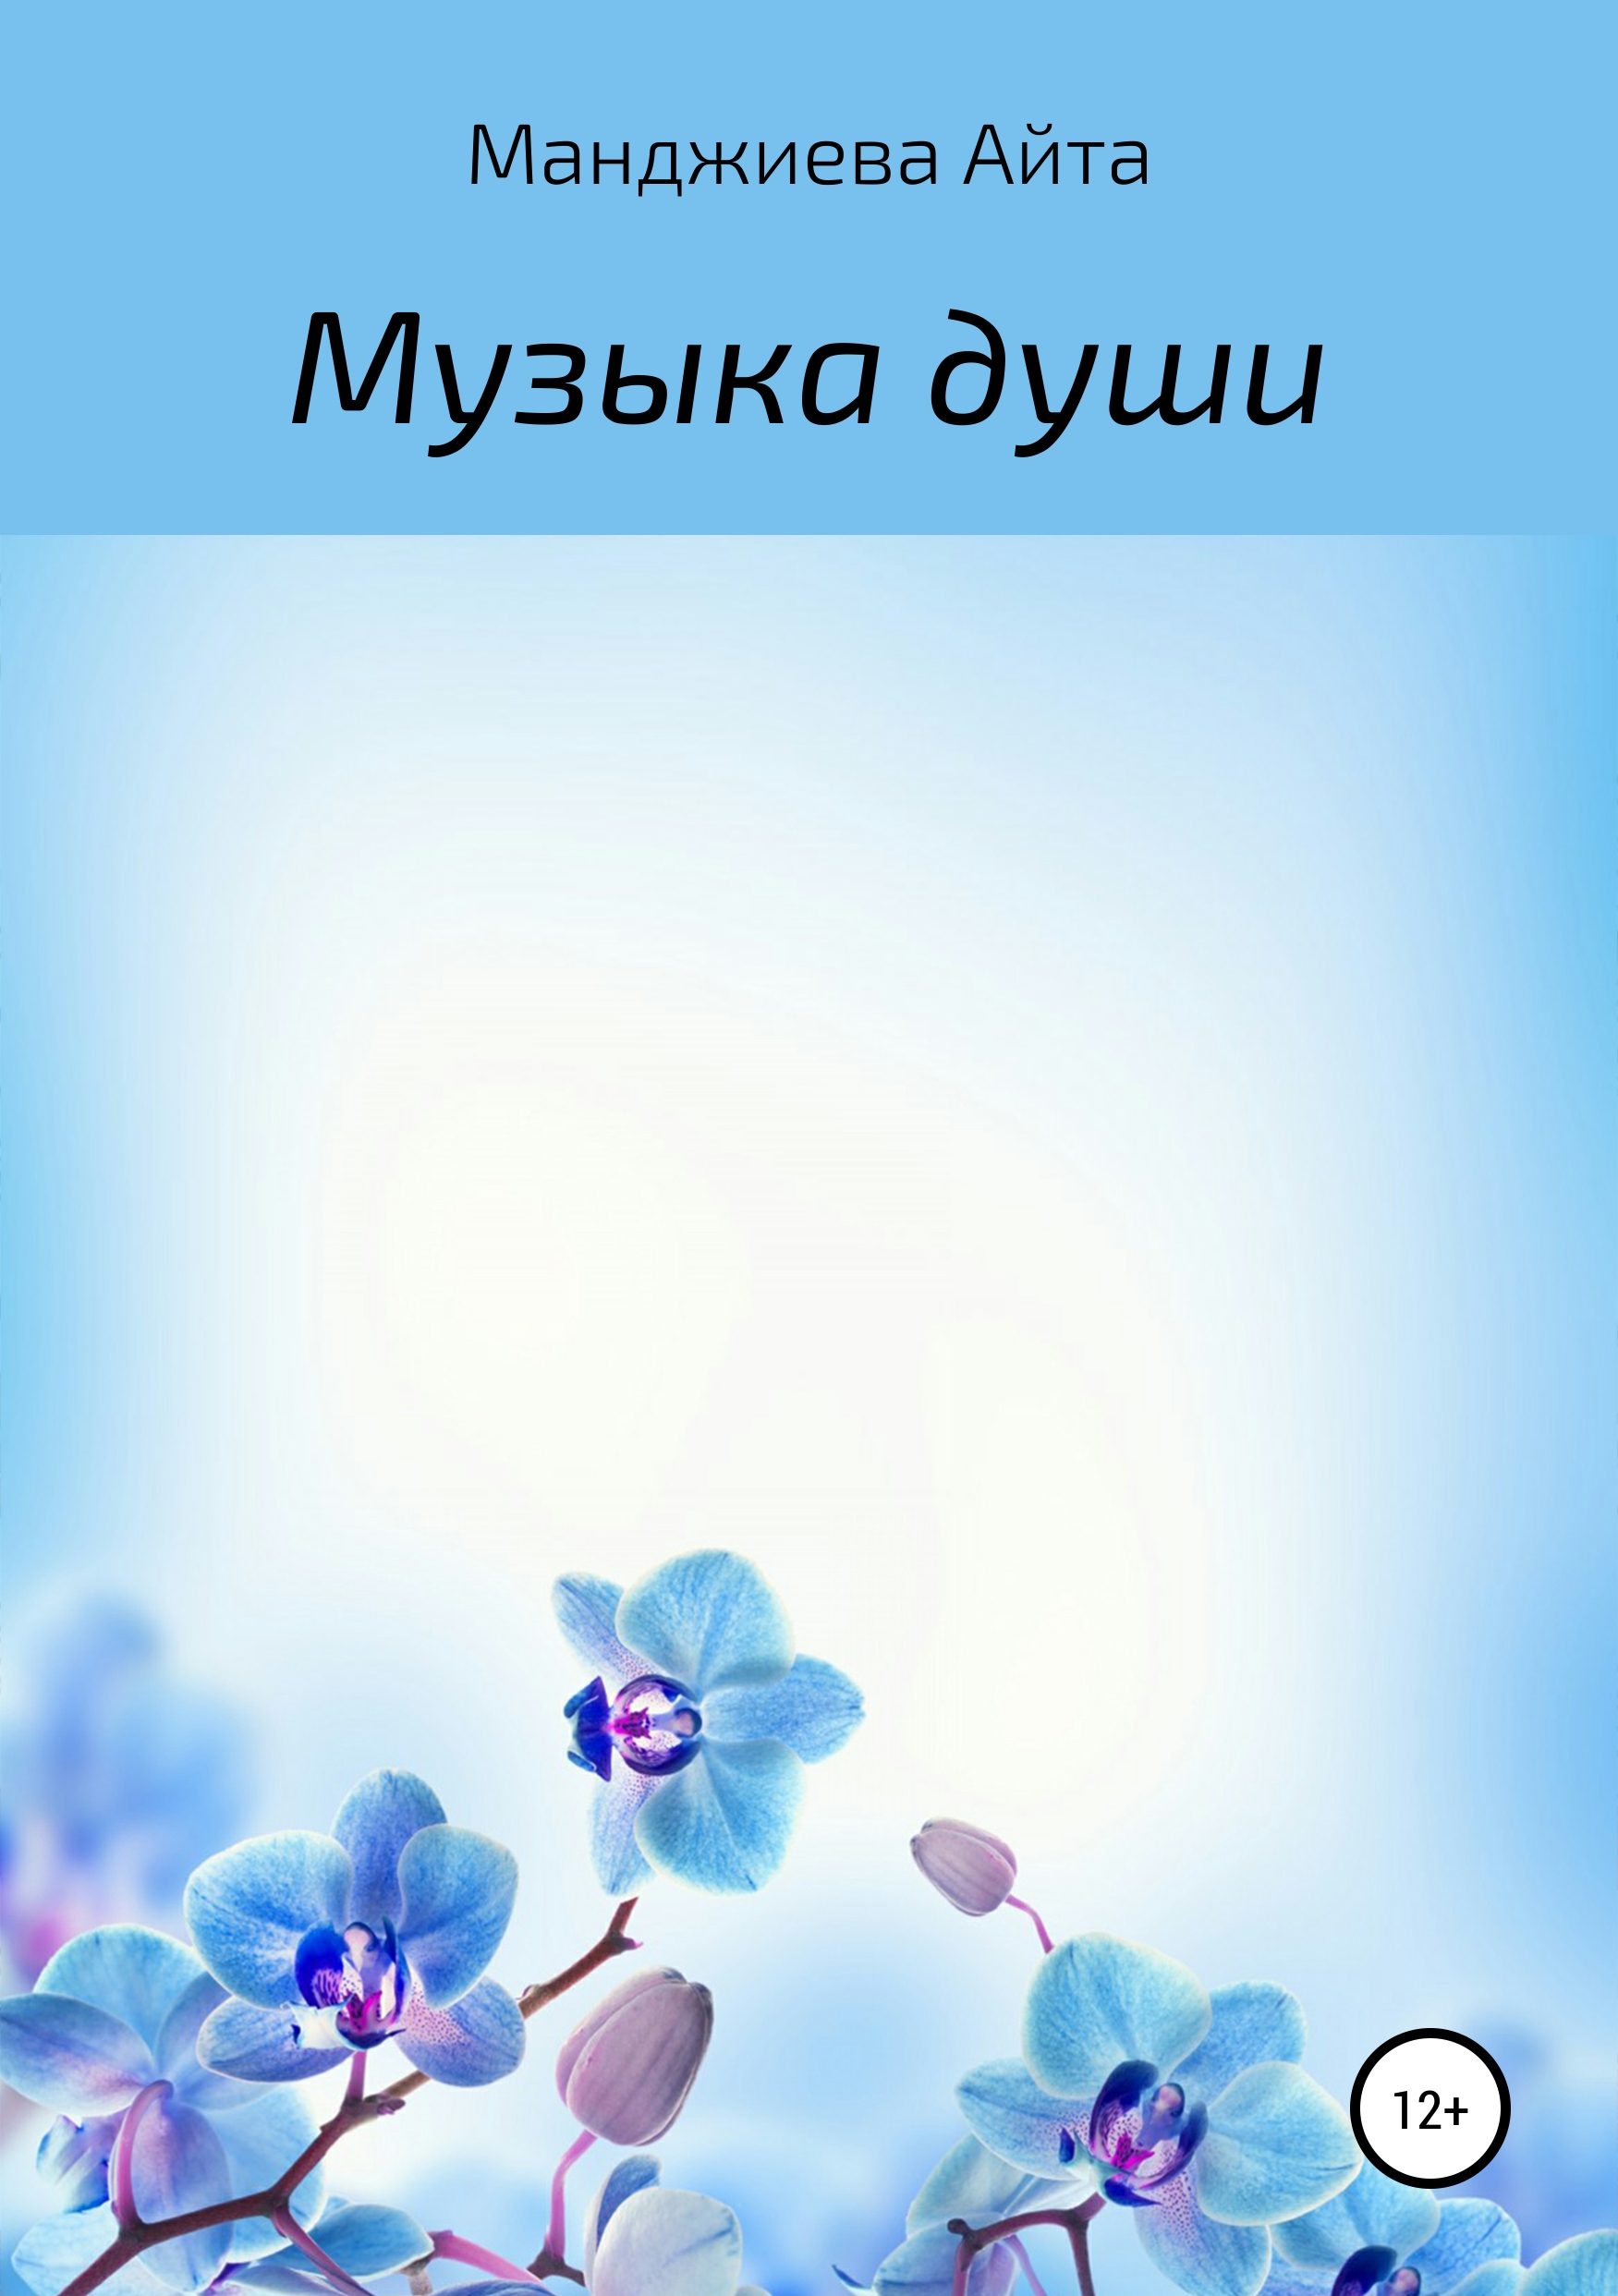 Айта Павловна Манджиева Музыка души наталья мадам herzlich минигараева музыка моейдуши стихи